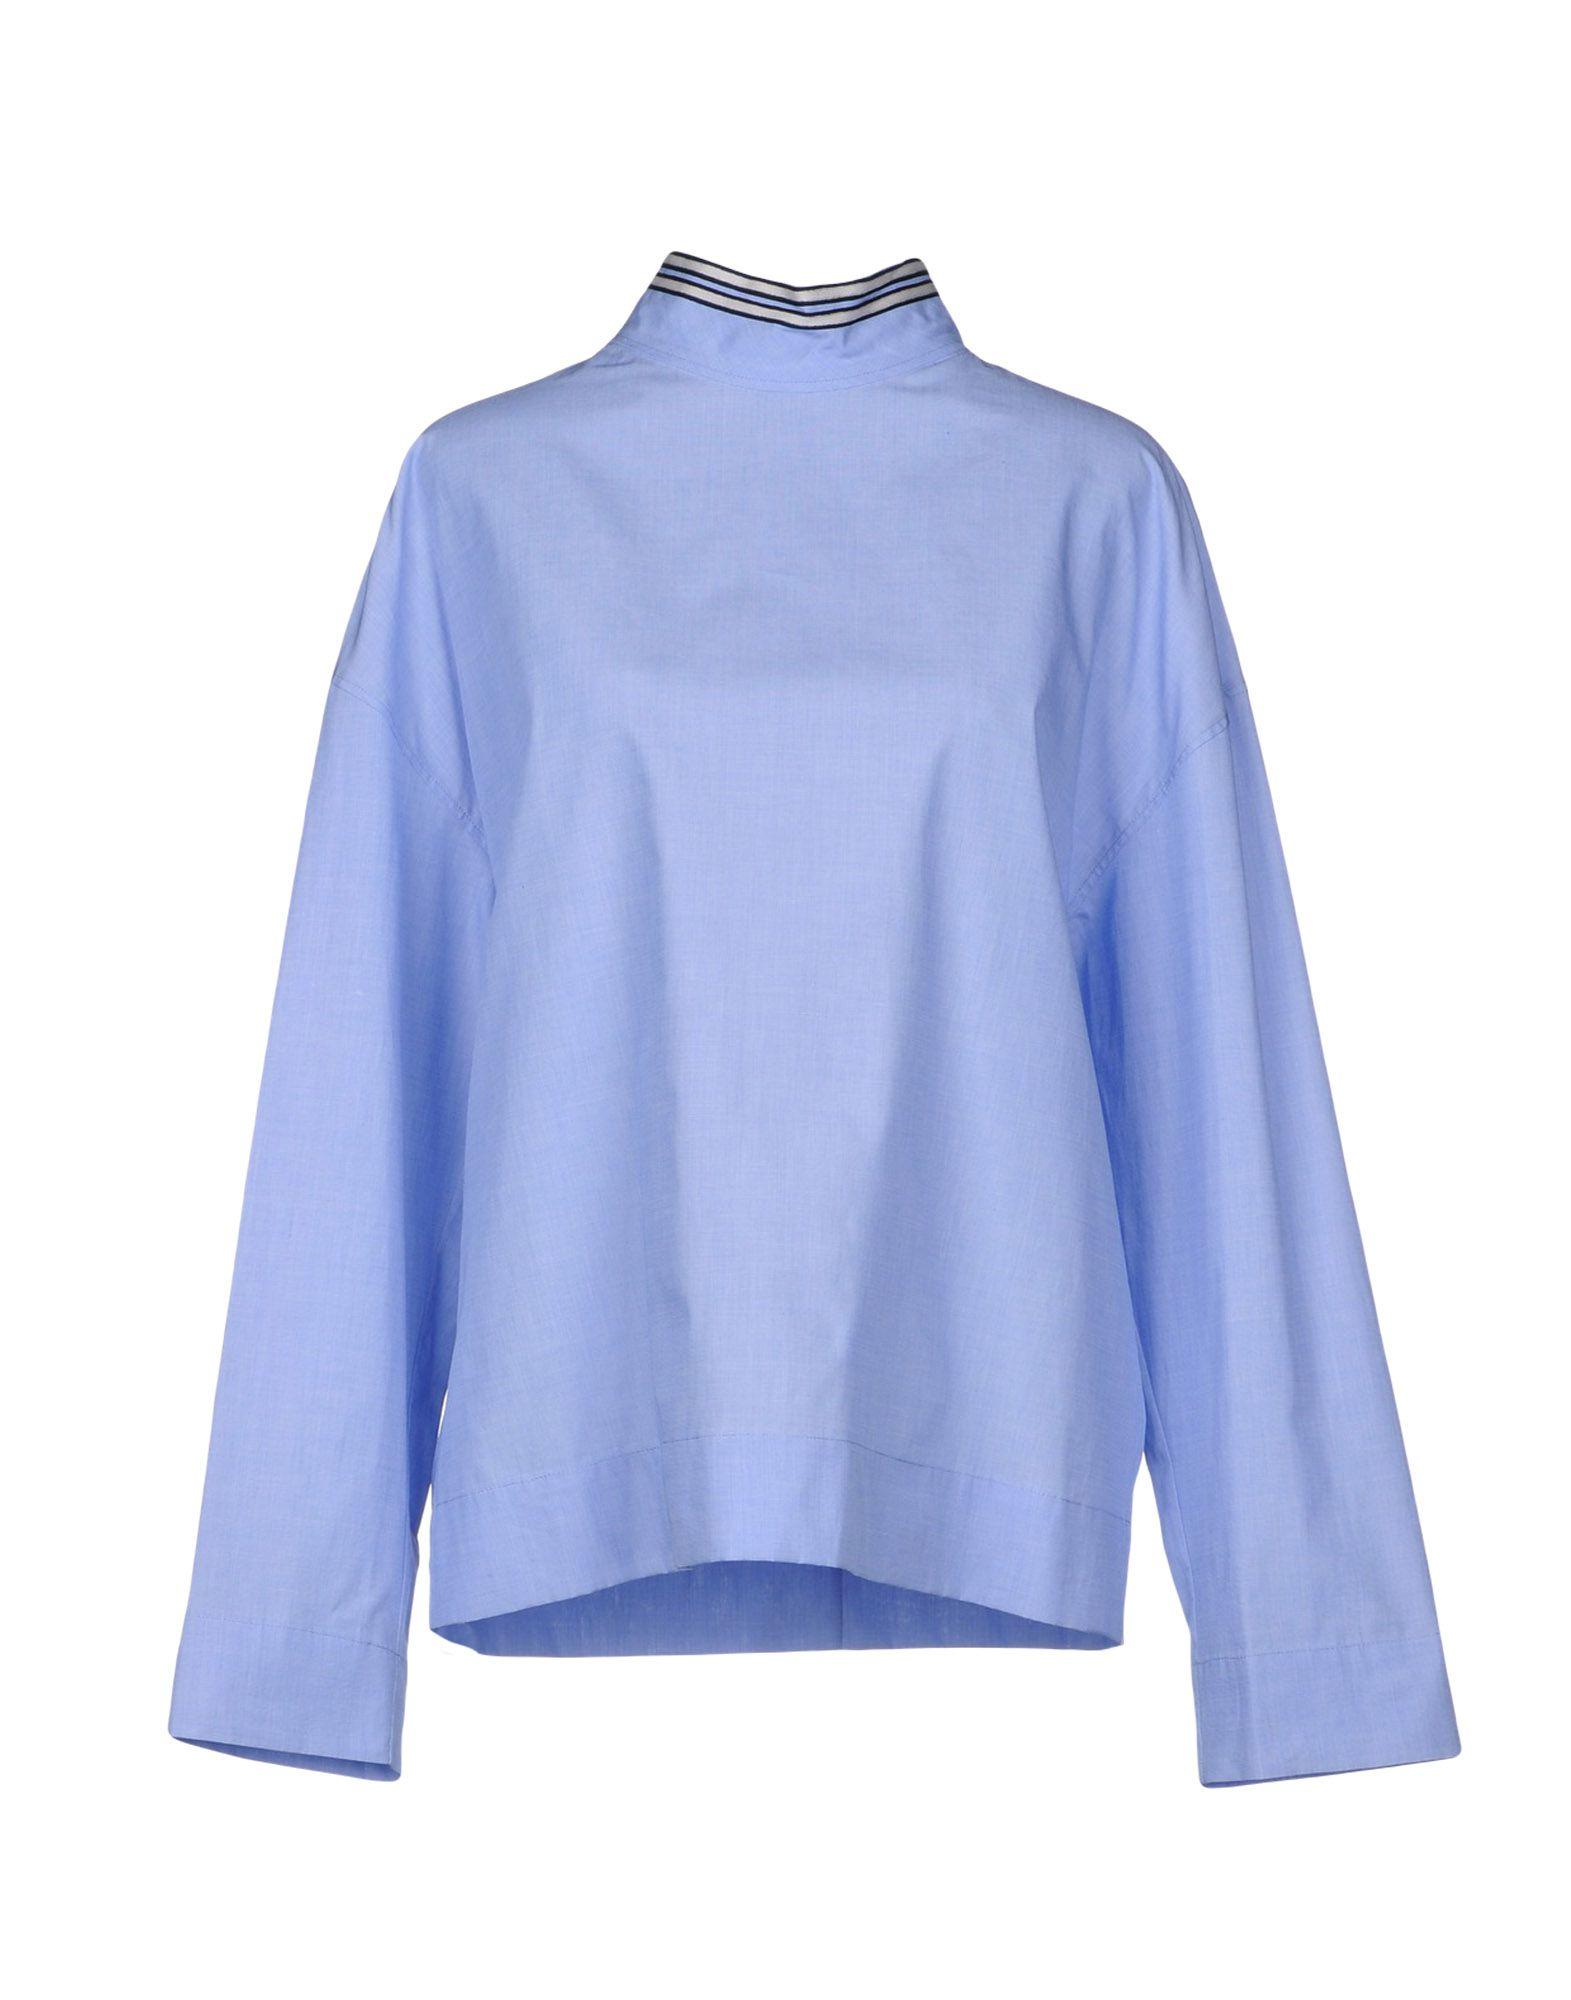 CEDRIC CHARLIER Блузка cedric charlier